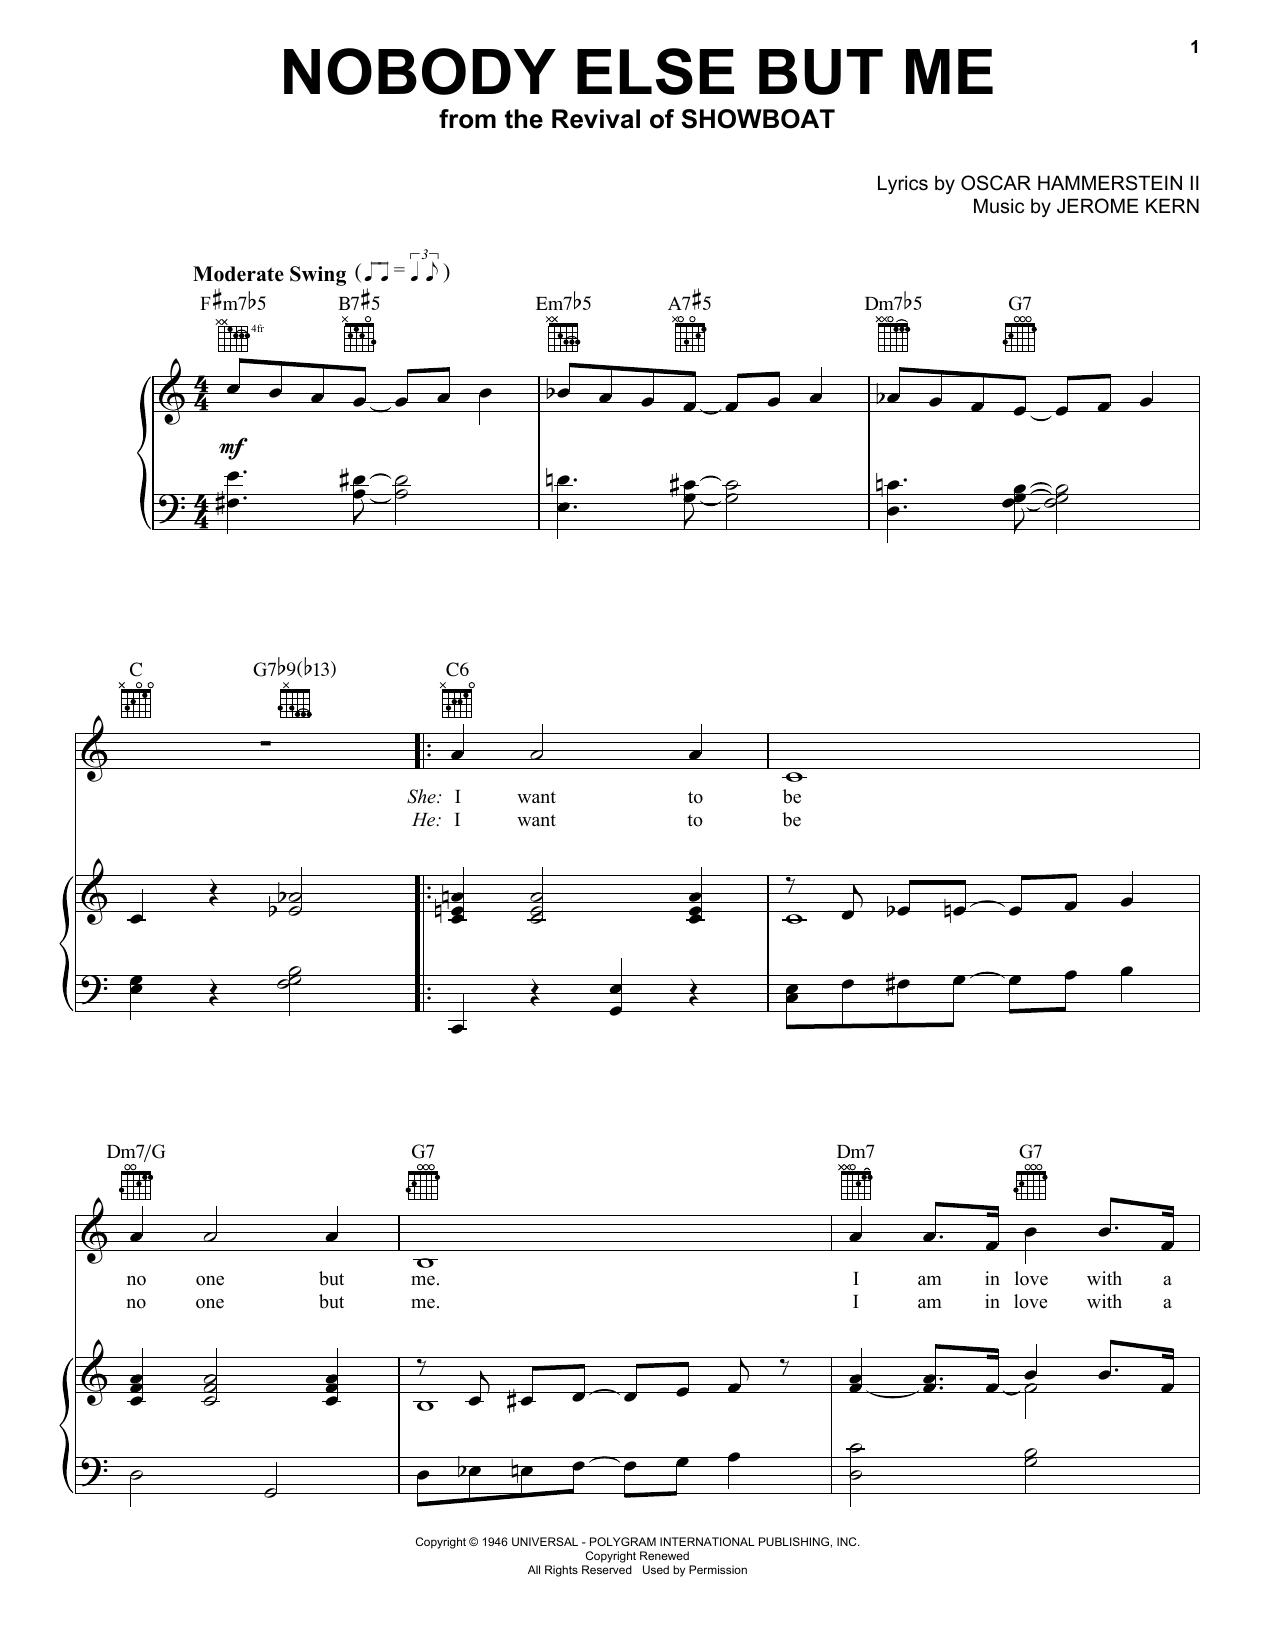 Jerome Kern Nobody Else But Me Sheet Music Download Pdf Score 61261 G f#m bm verse 1: jerome kern nobody else but me sheet